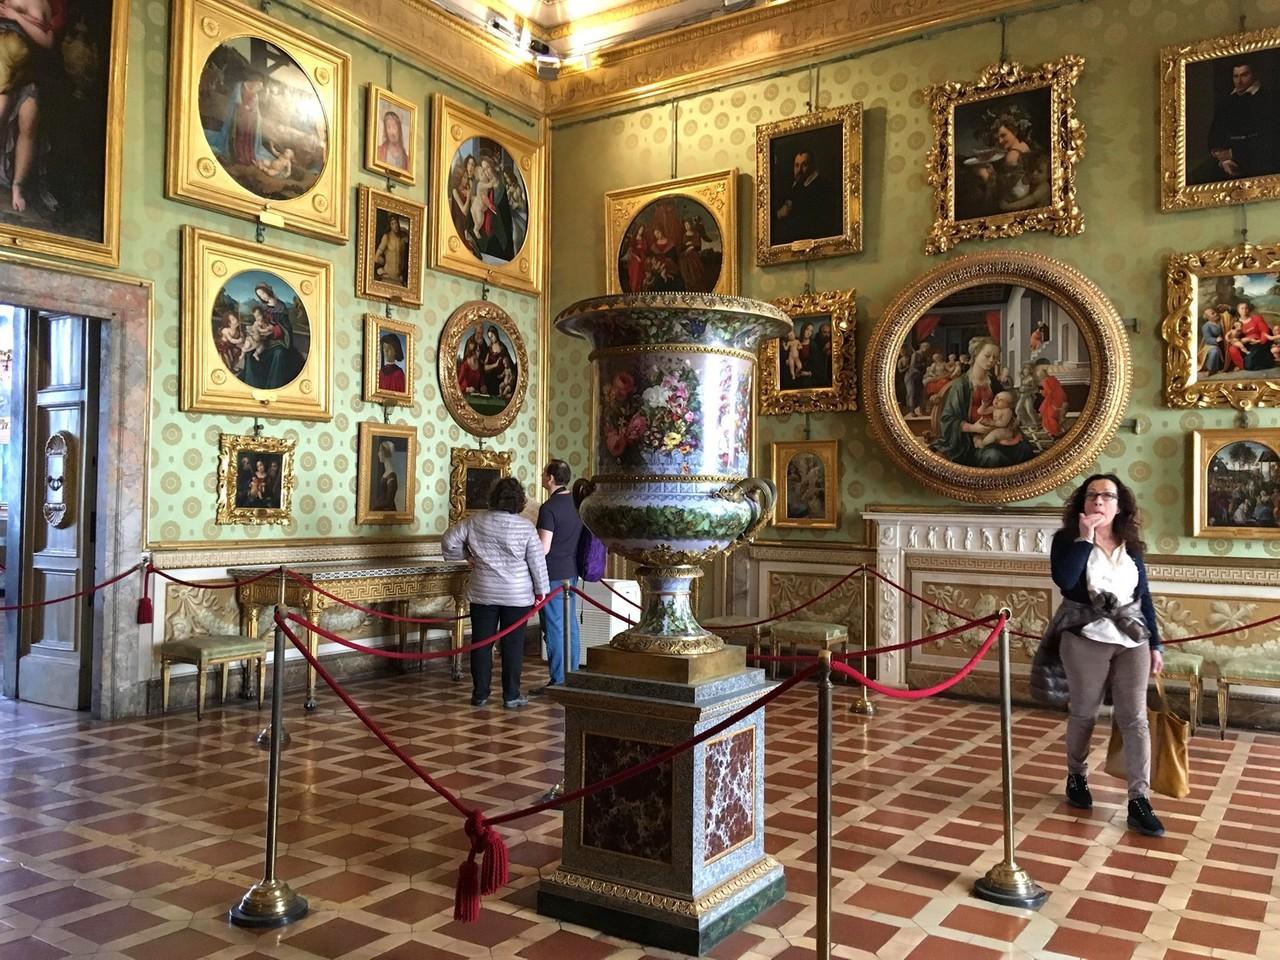 Палаццо Питти, Палатинская галерея